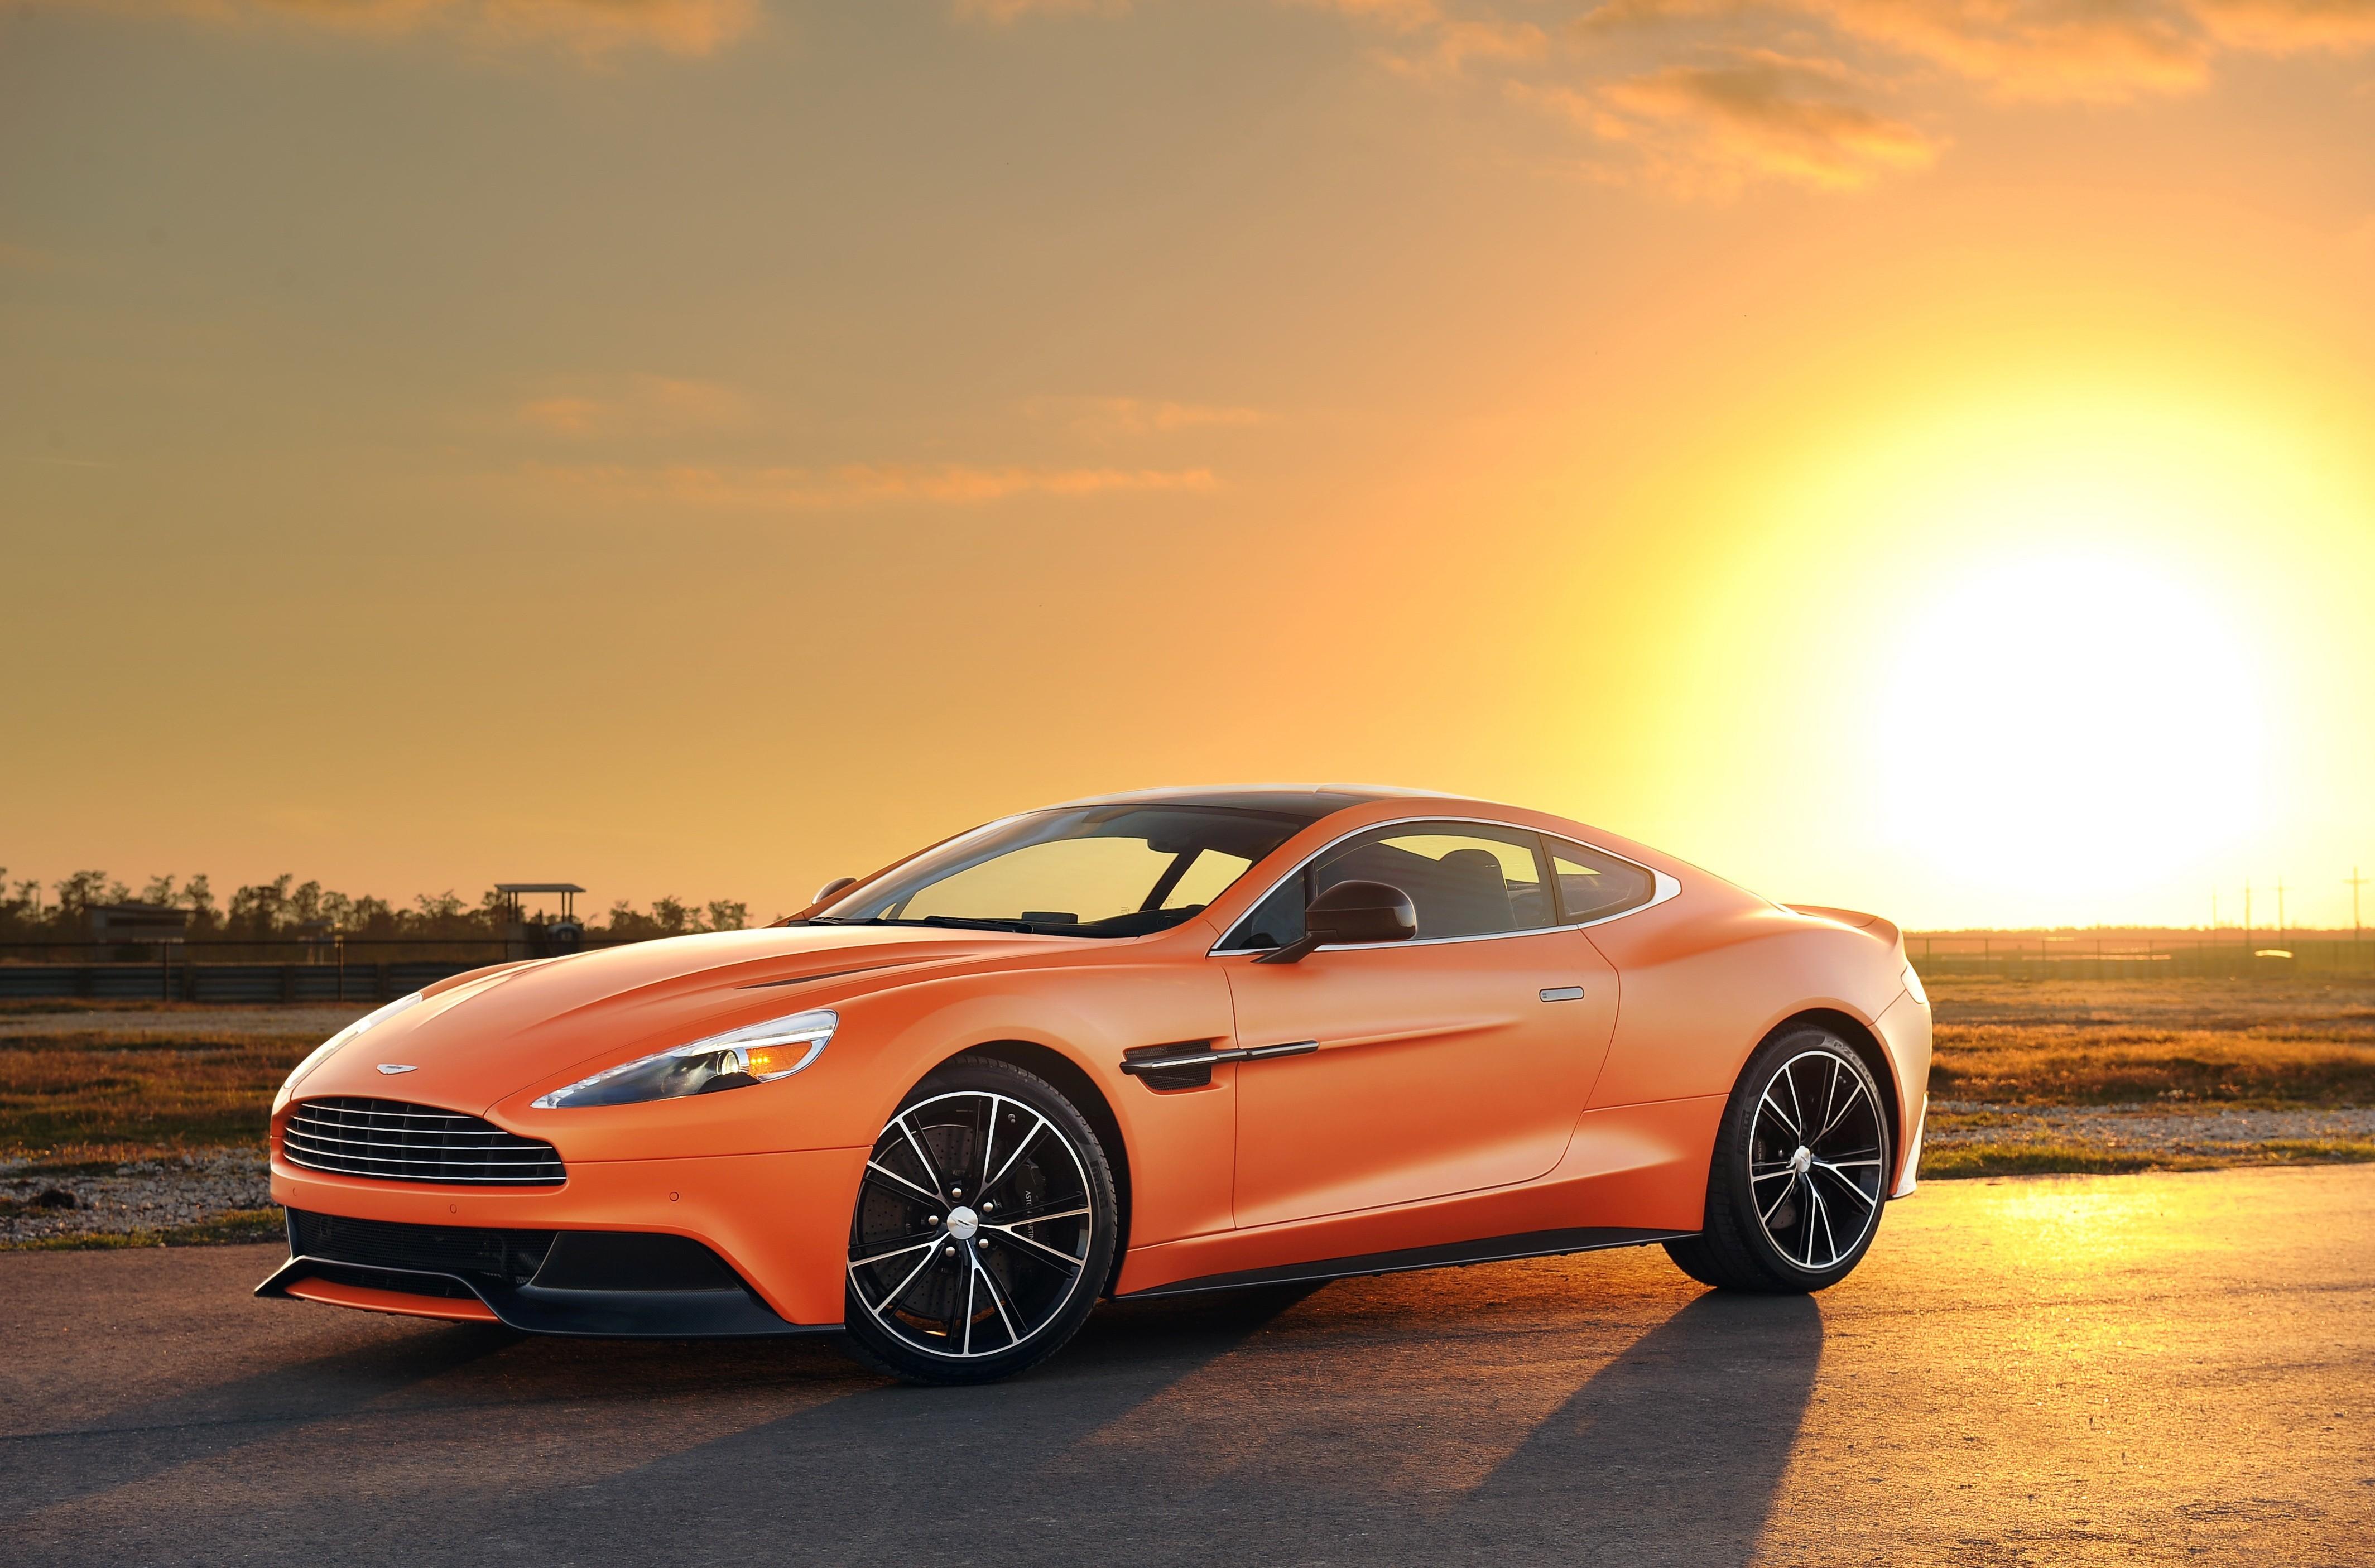 Aston Martin Vanquish 4k Ultra Hd Wallpaper Background